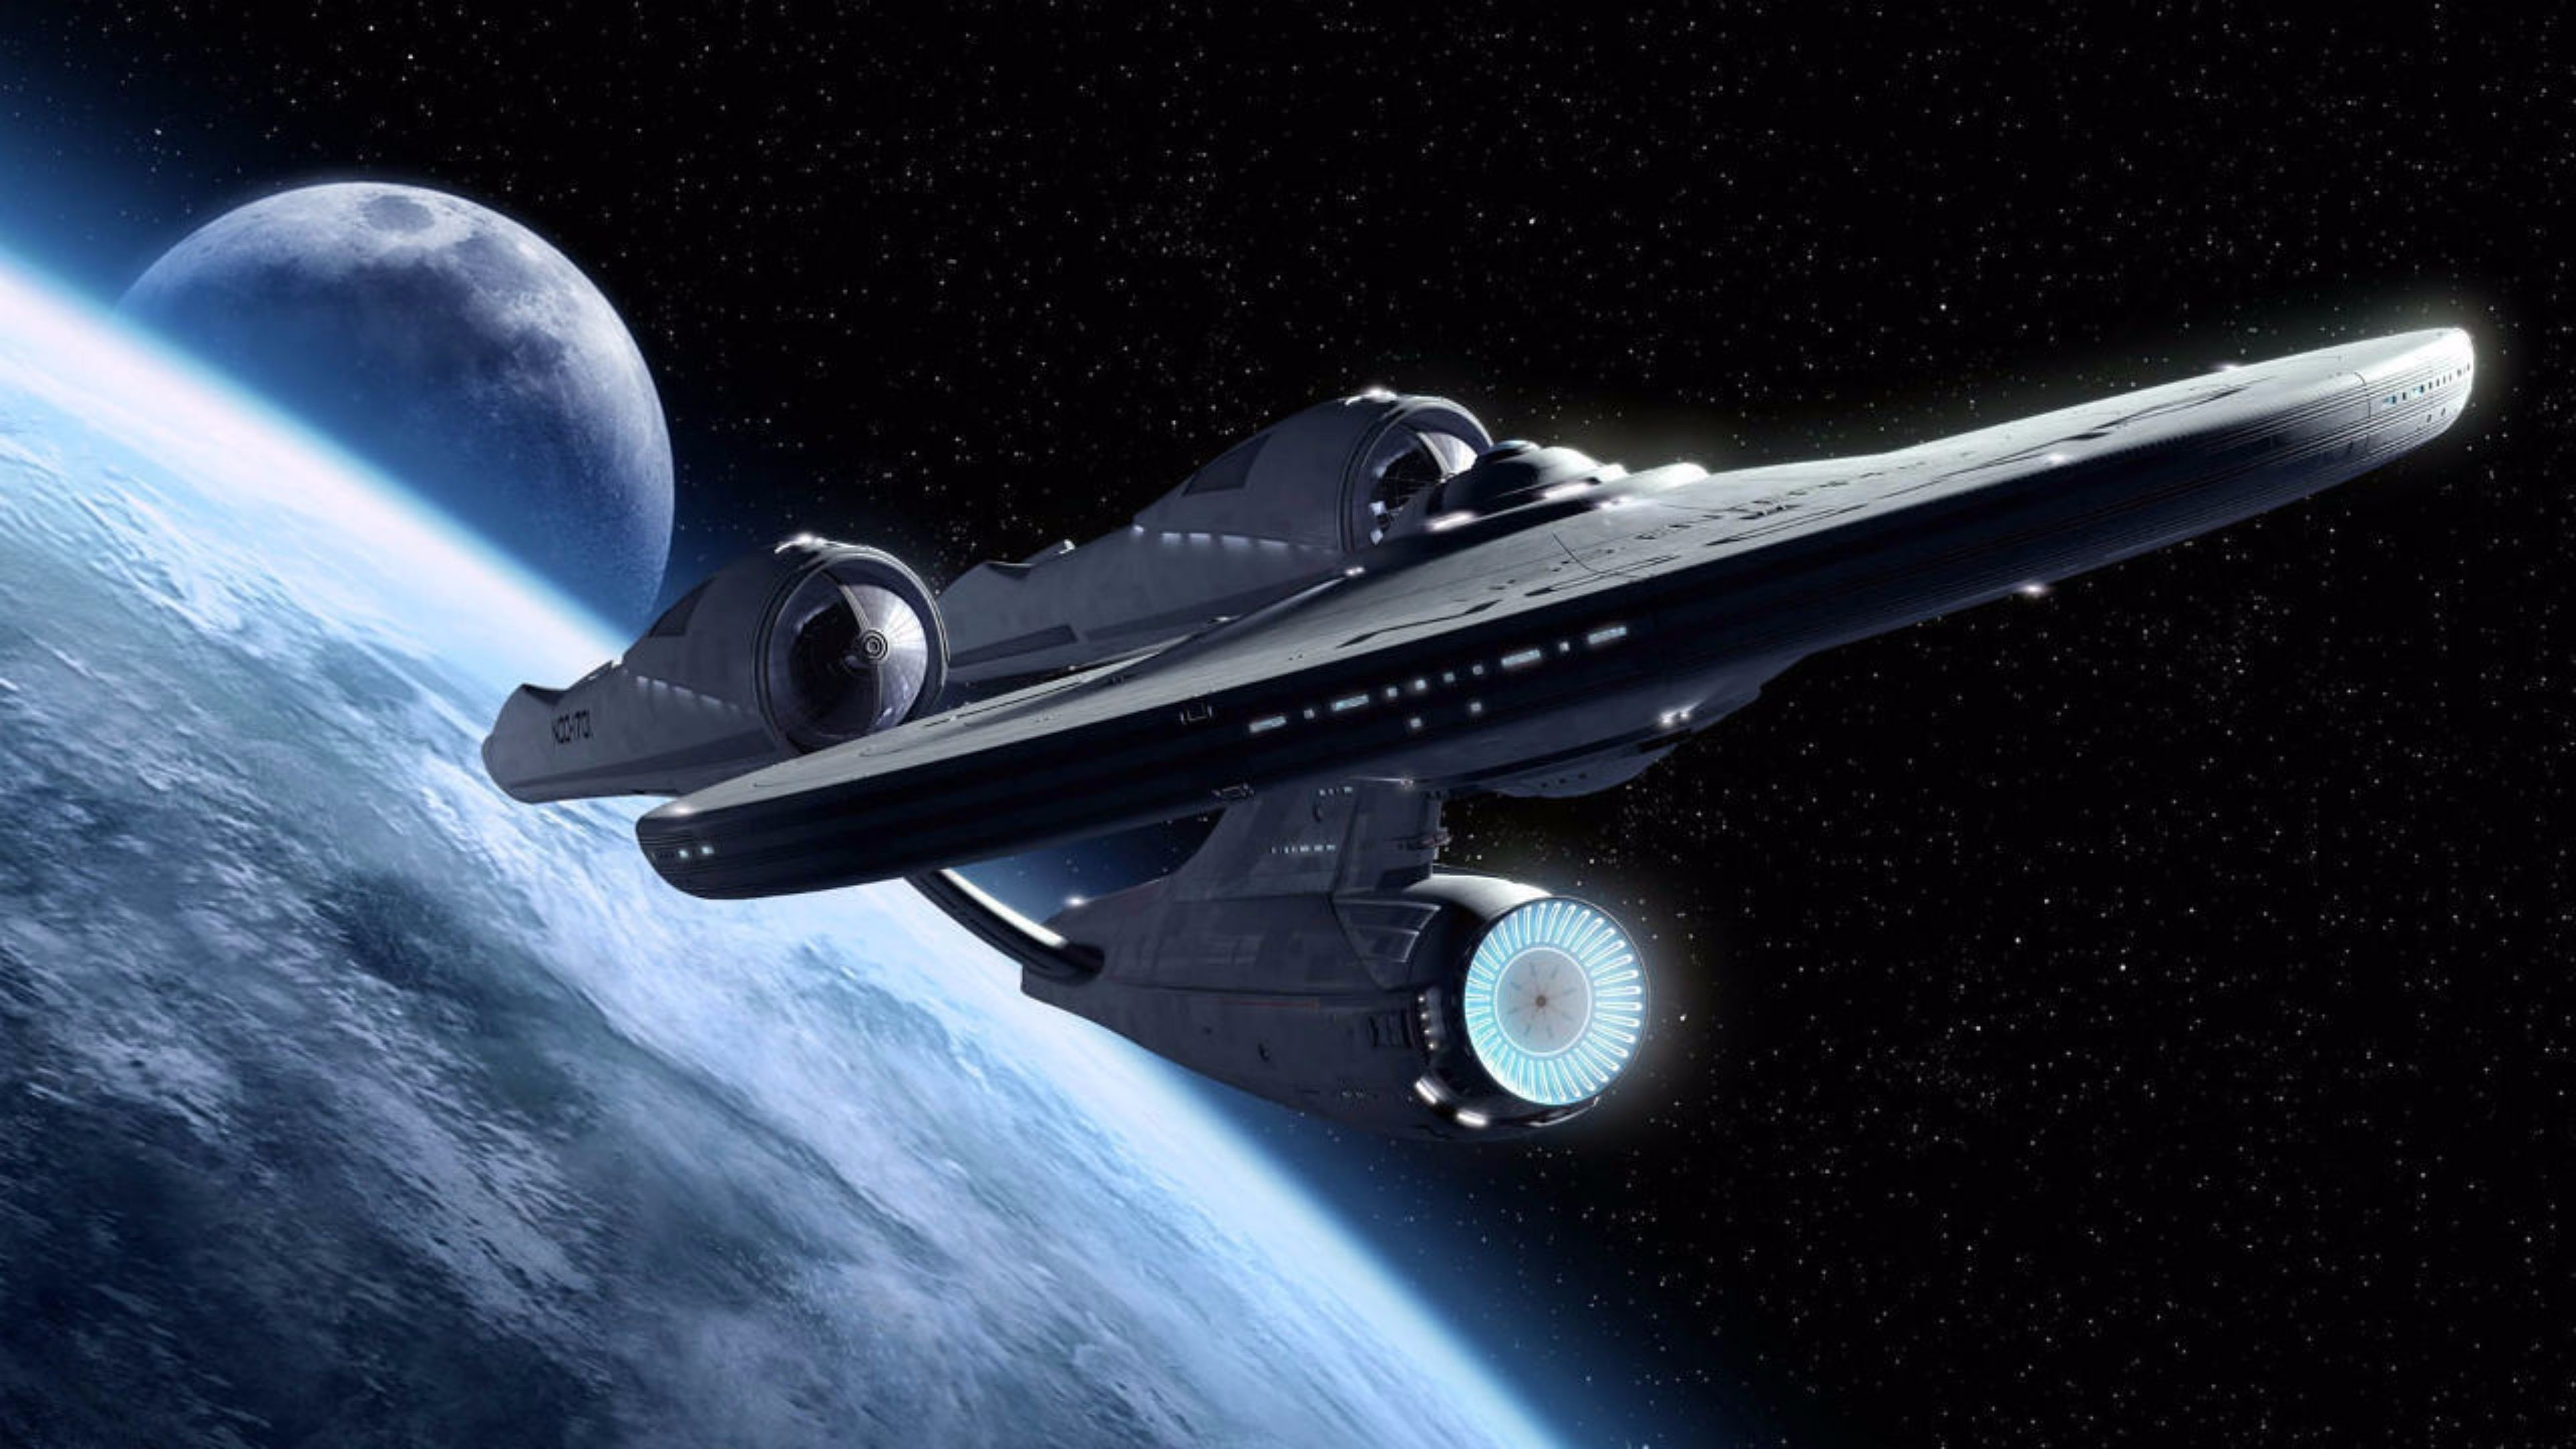 Stunning-Star-Trek-Beyond-Wallpaper